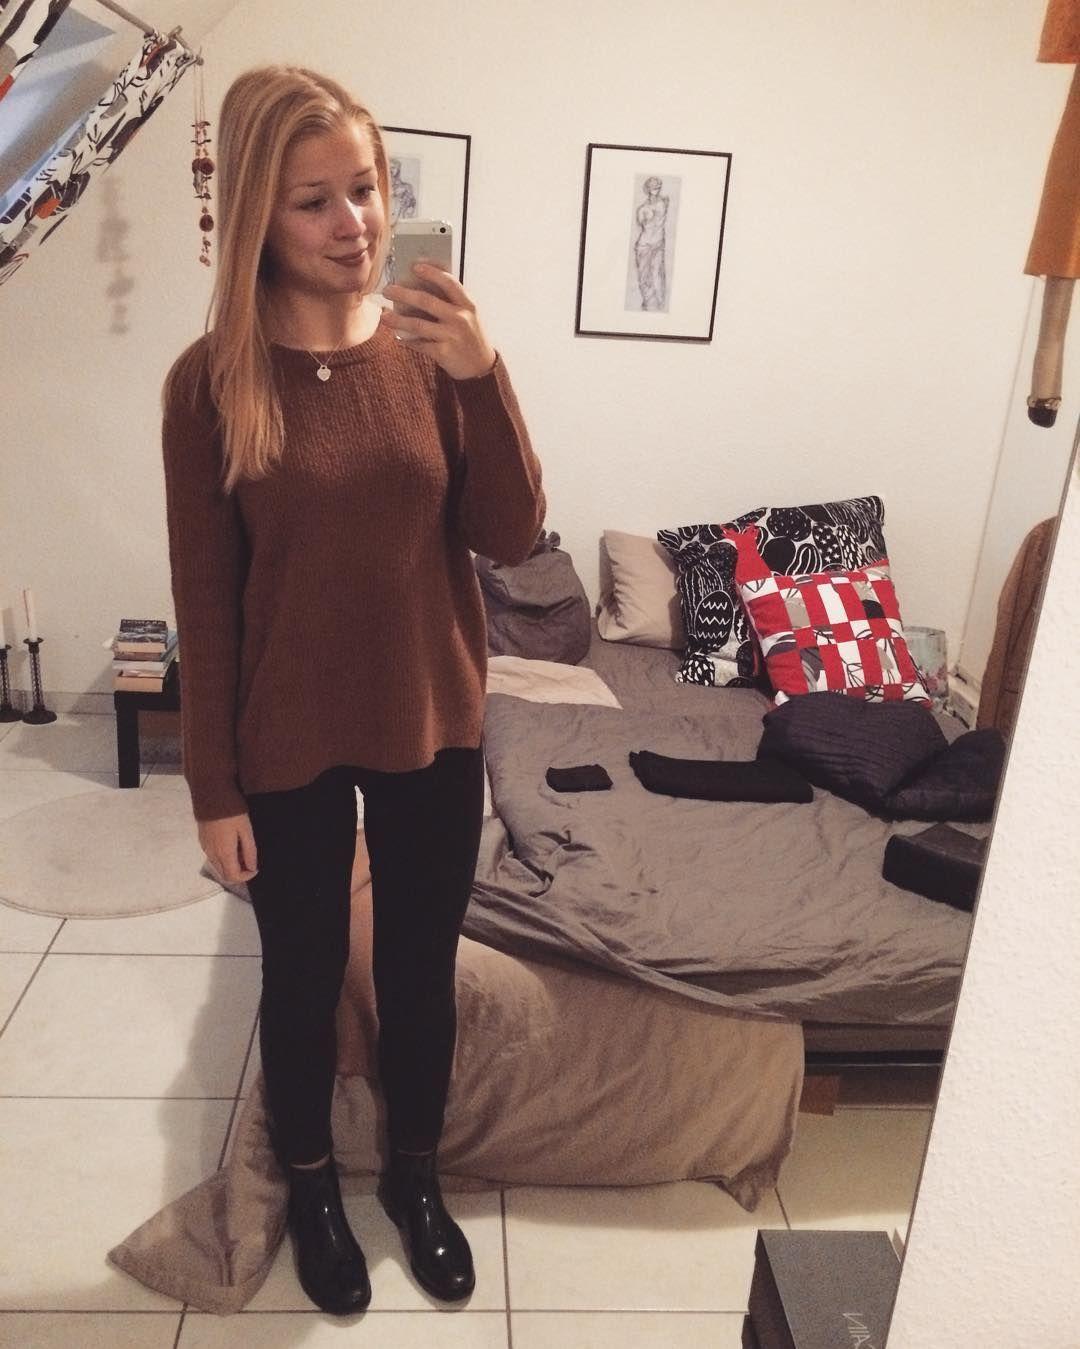 me blonde girl selfie selfiequeen student uni ffm frankfurt